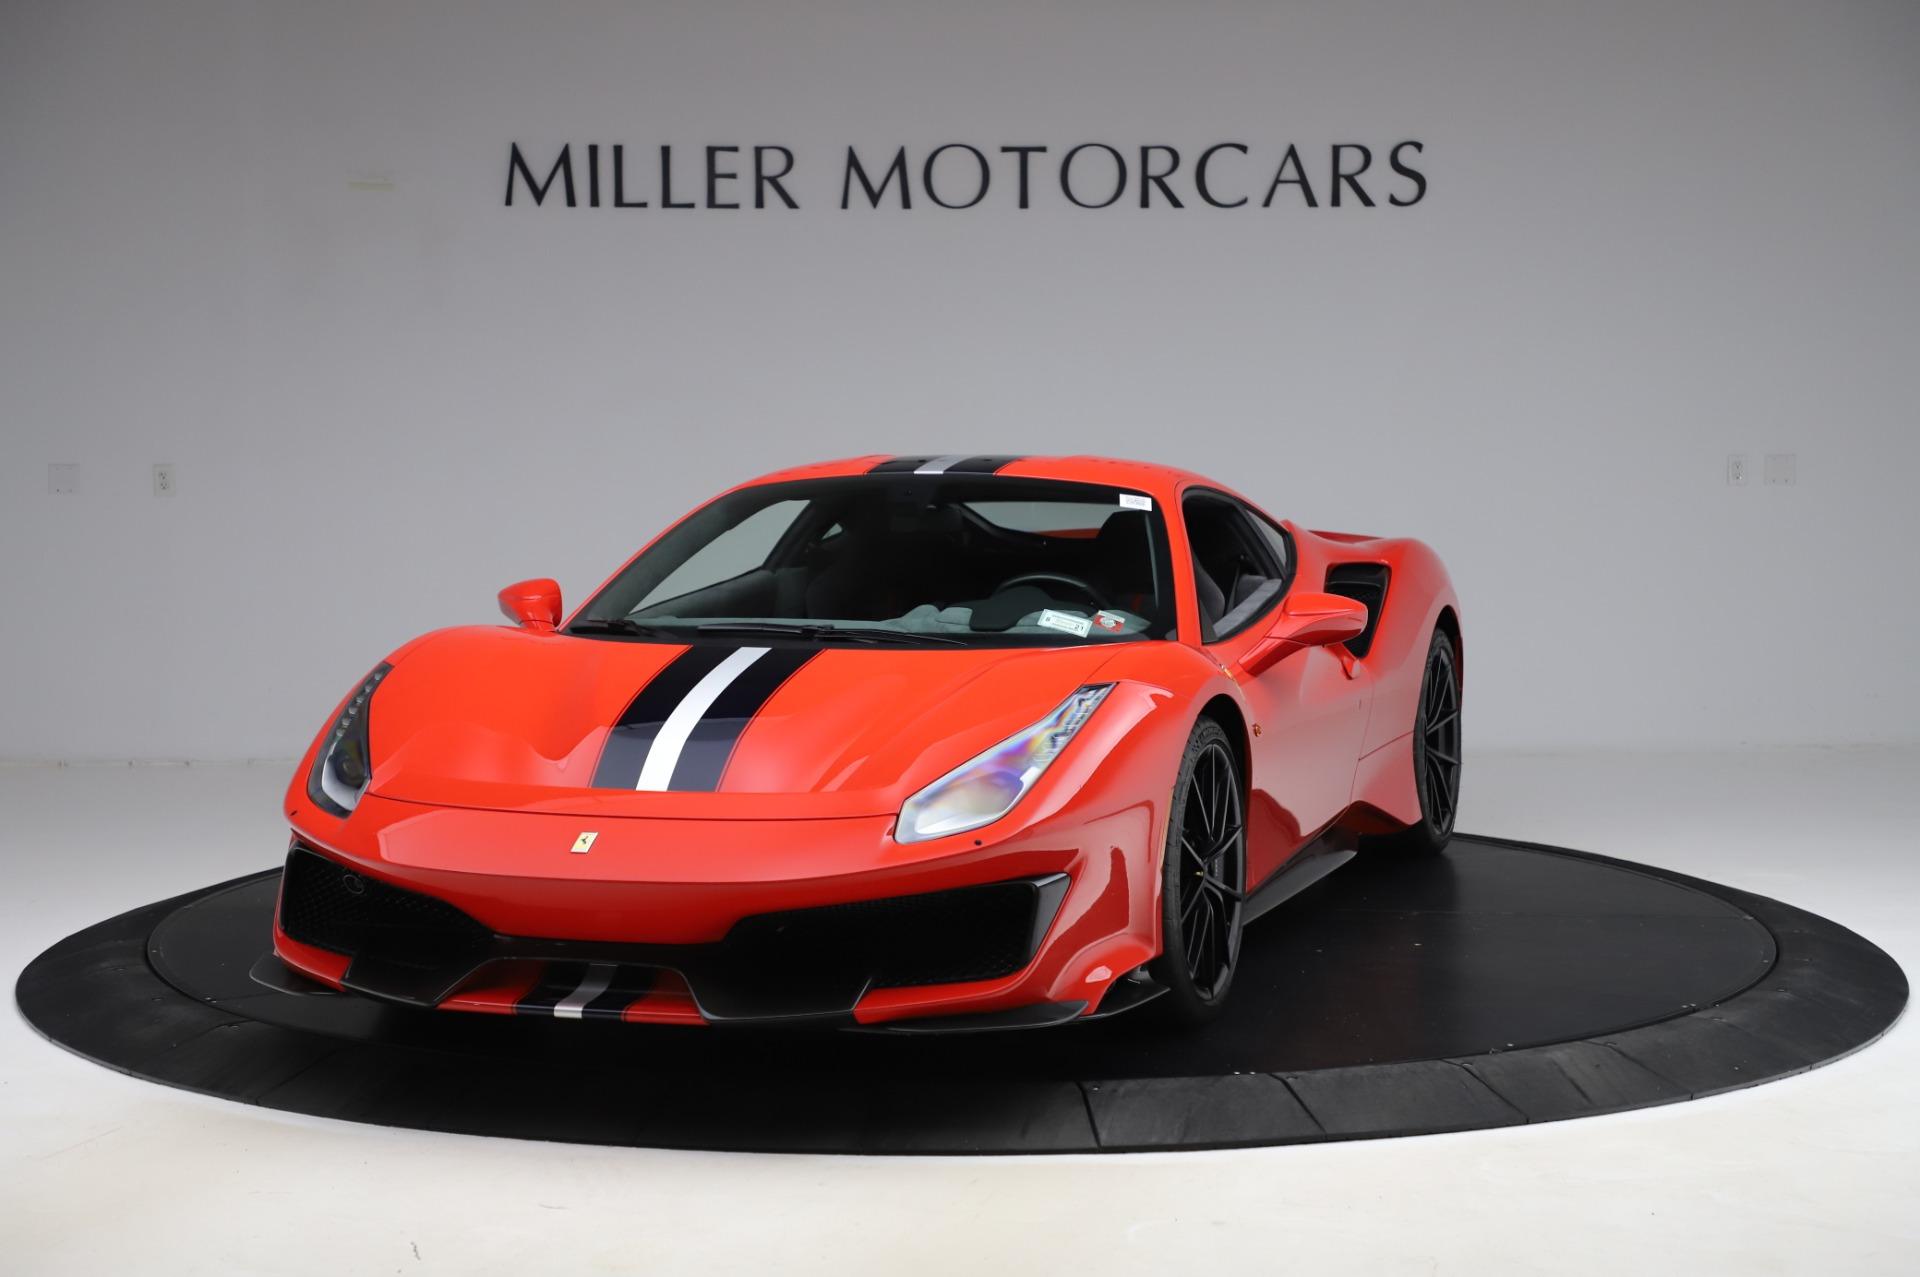 Used 2020 Ferrari 488 Pista for sale $439,900 at Aston Martin of Greenwich in Greenwich CT 06830 1